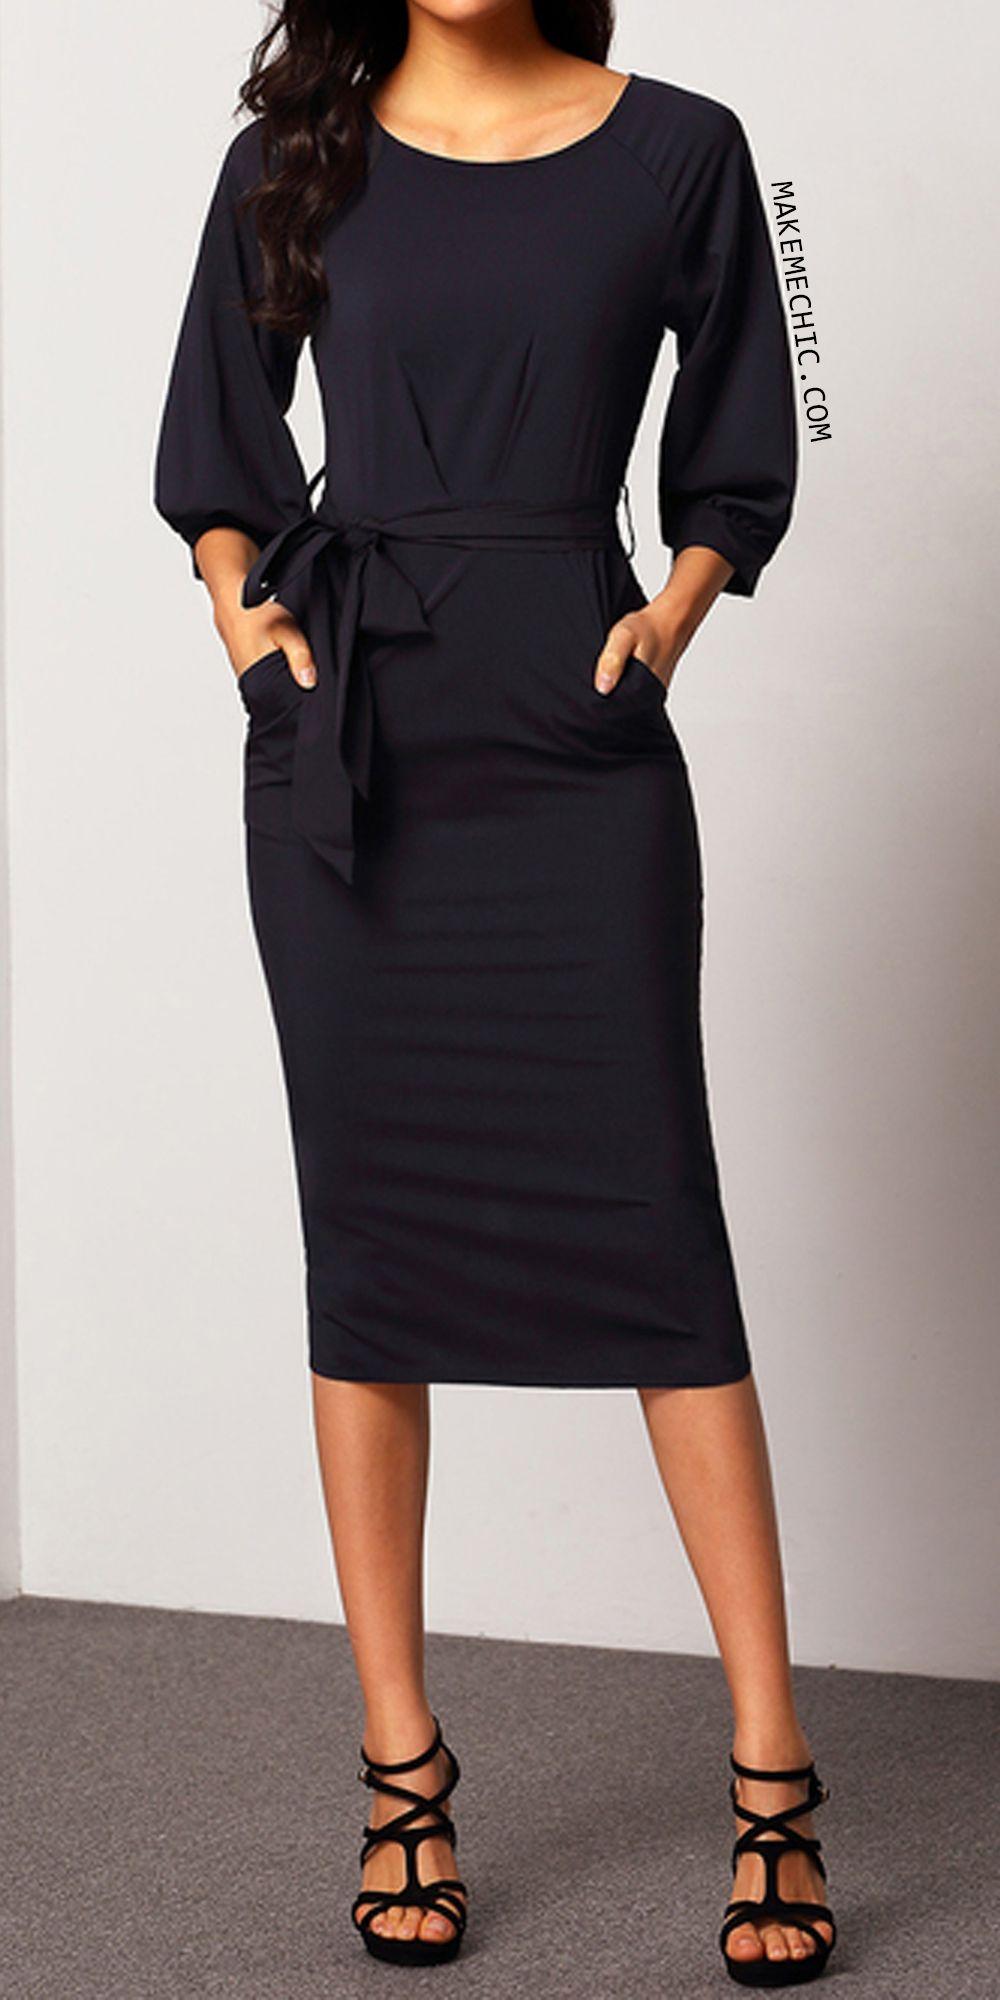 Lace dress styles for funeral  Puff Sleeve Belt Chiffon Slim Dress  MakeMeChicCOM  Clothes